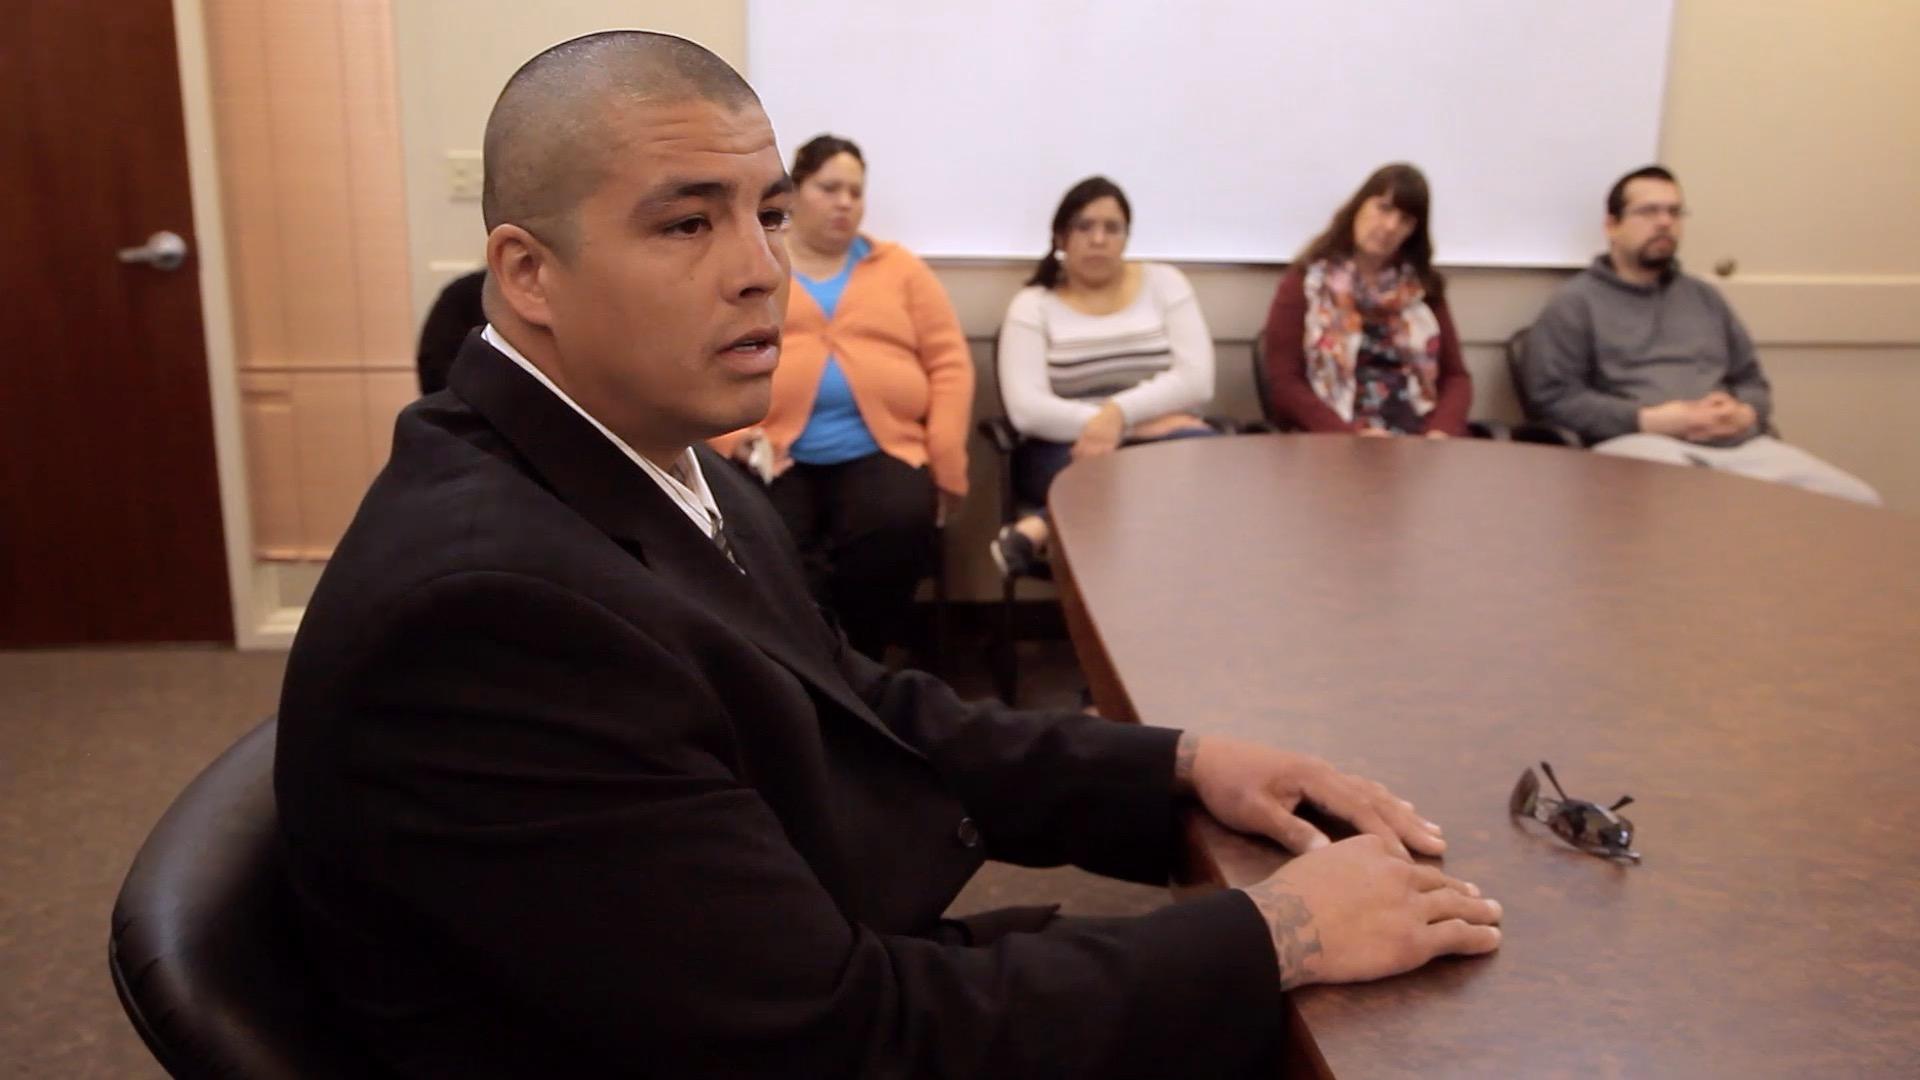 Yurok Tribe v. Taos Proctor